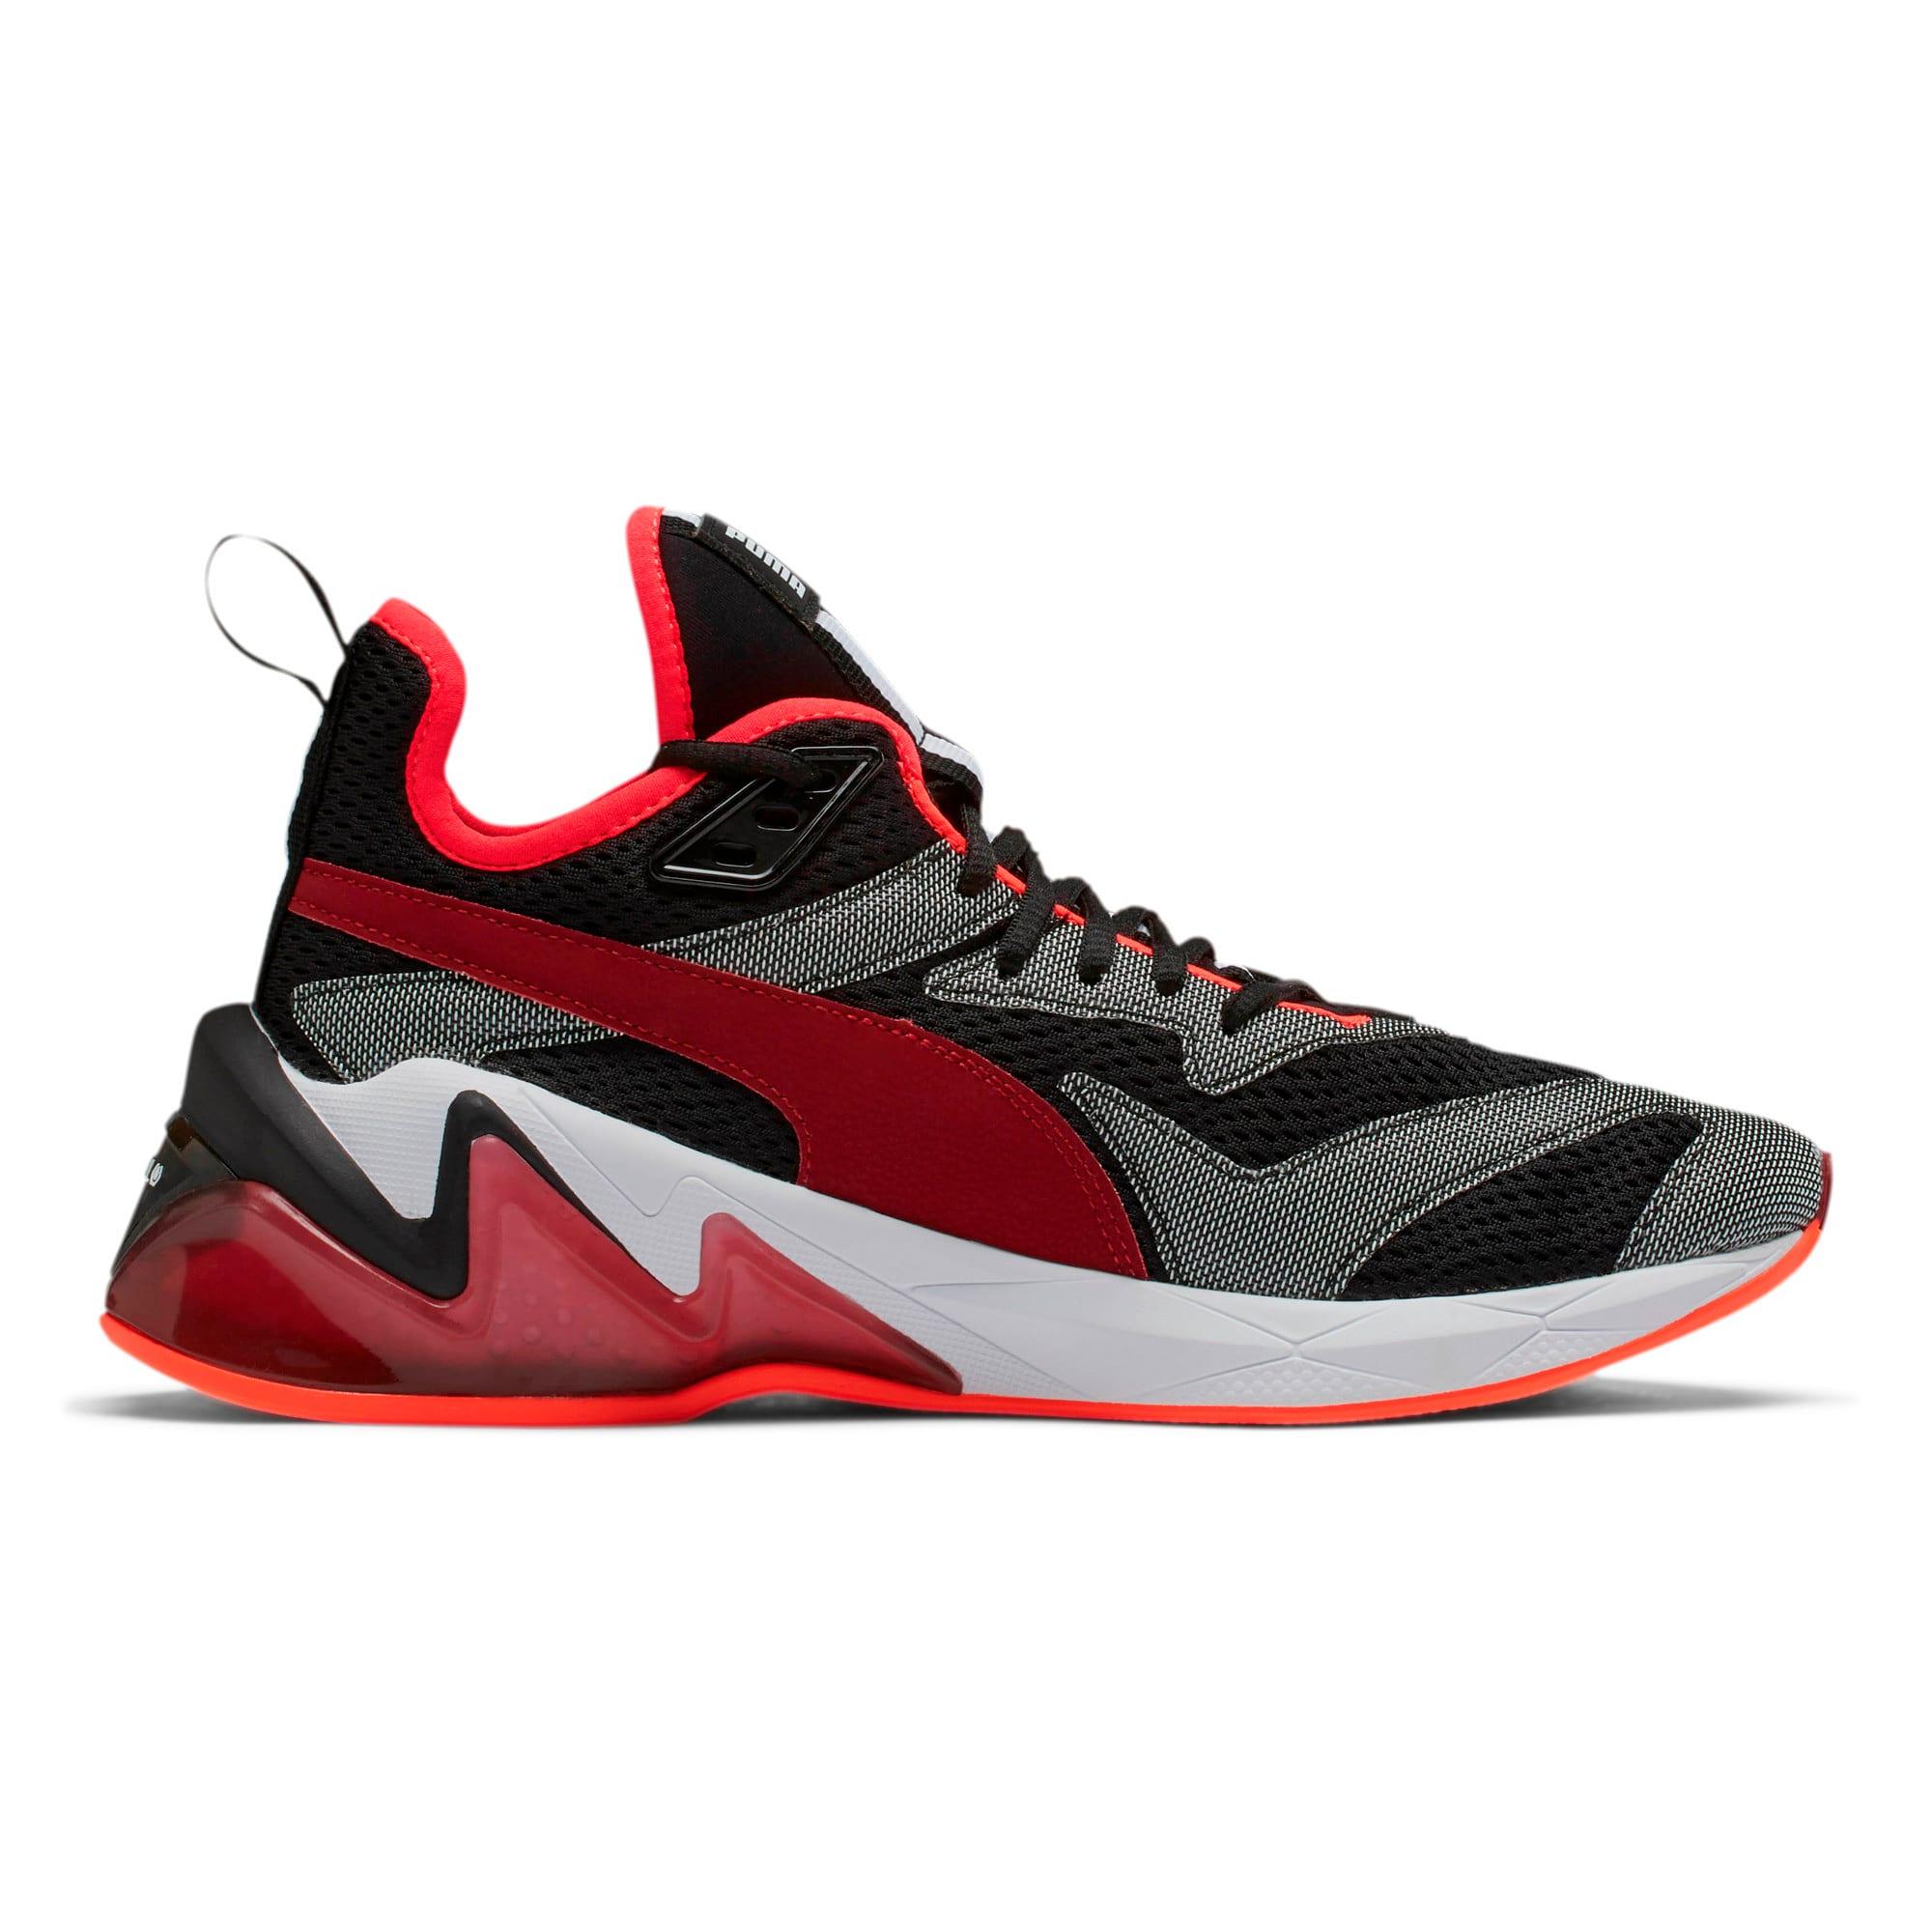 Thumbnail 6 of LQDCELL Origin Tech Men's Training Shoes, Puma Black-Rhubarb, medium